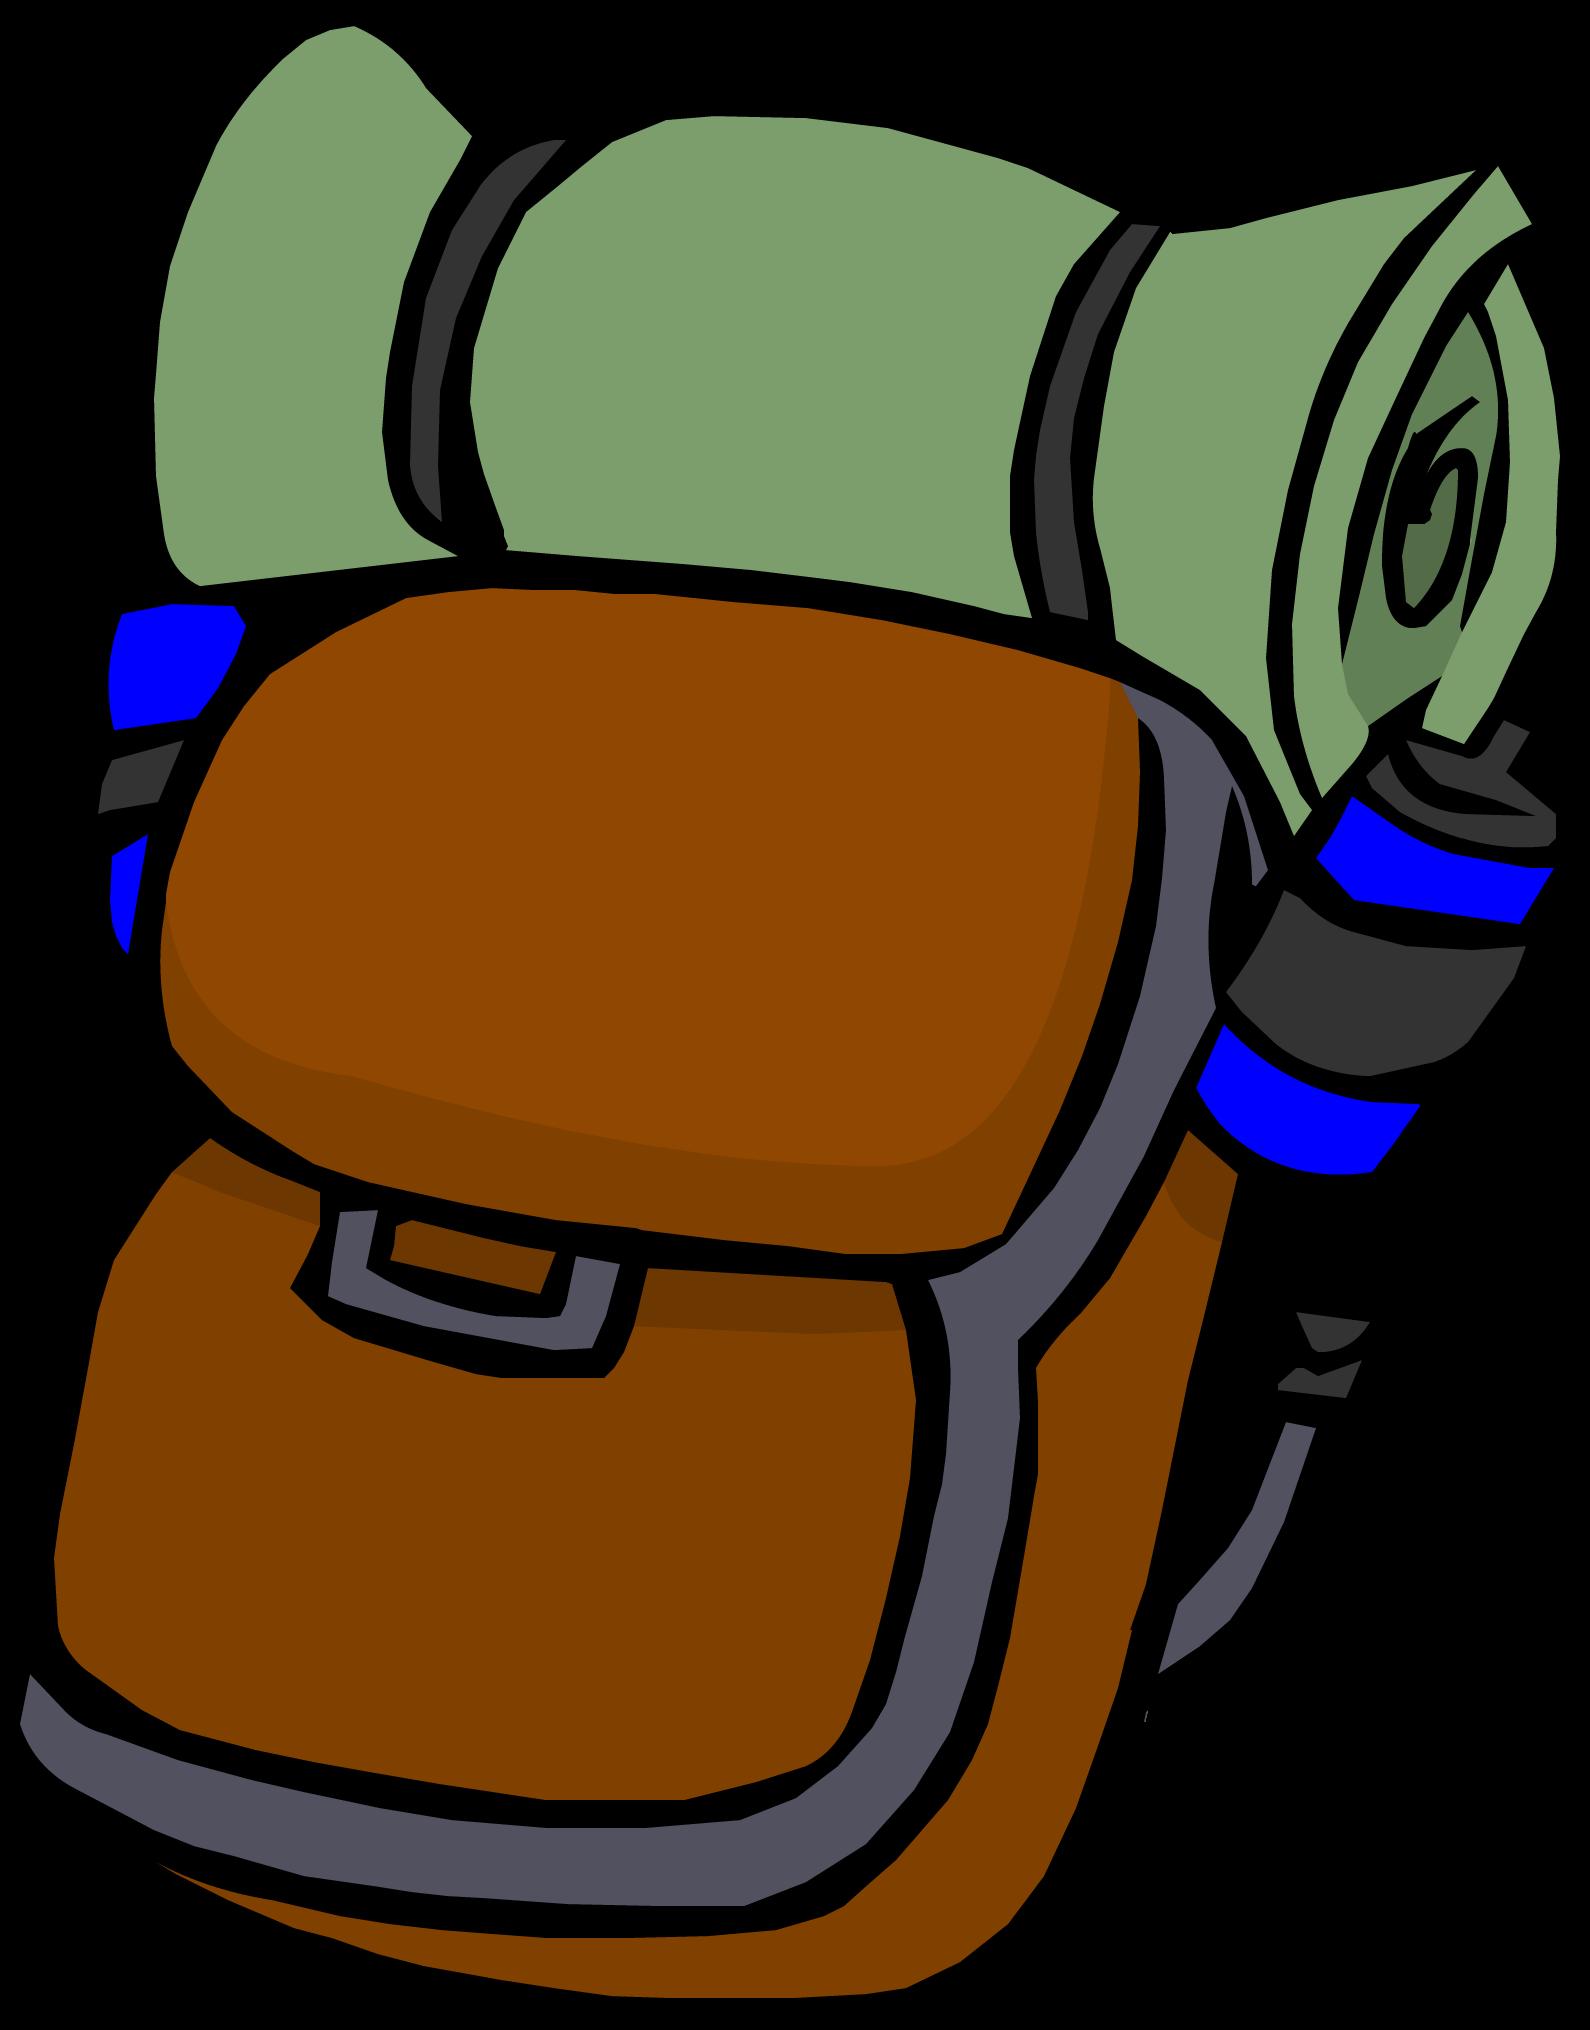 Hiking Backpack Club Penguin Wiki Fandom Powered By Wikia